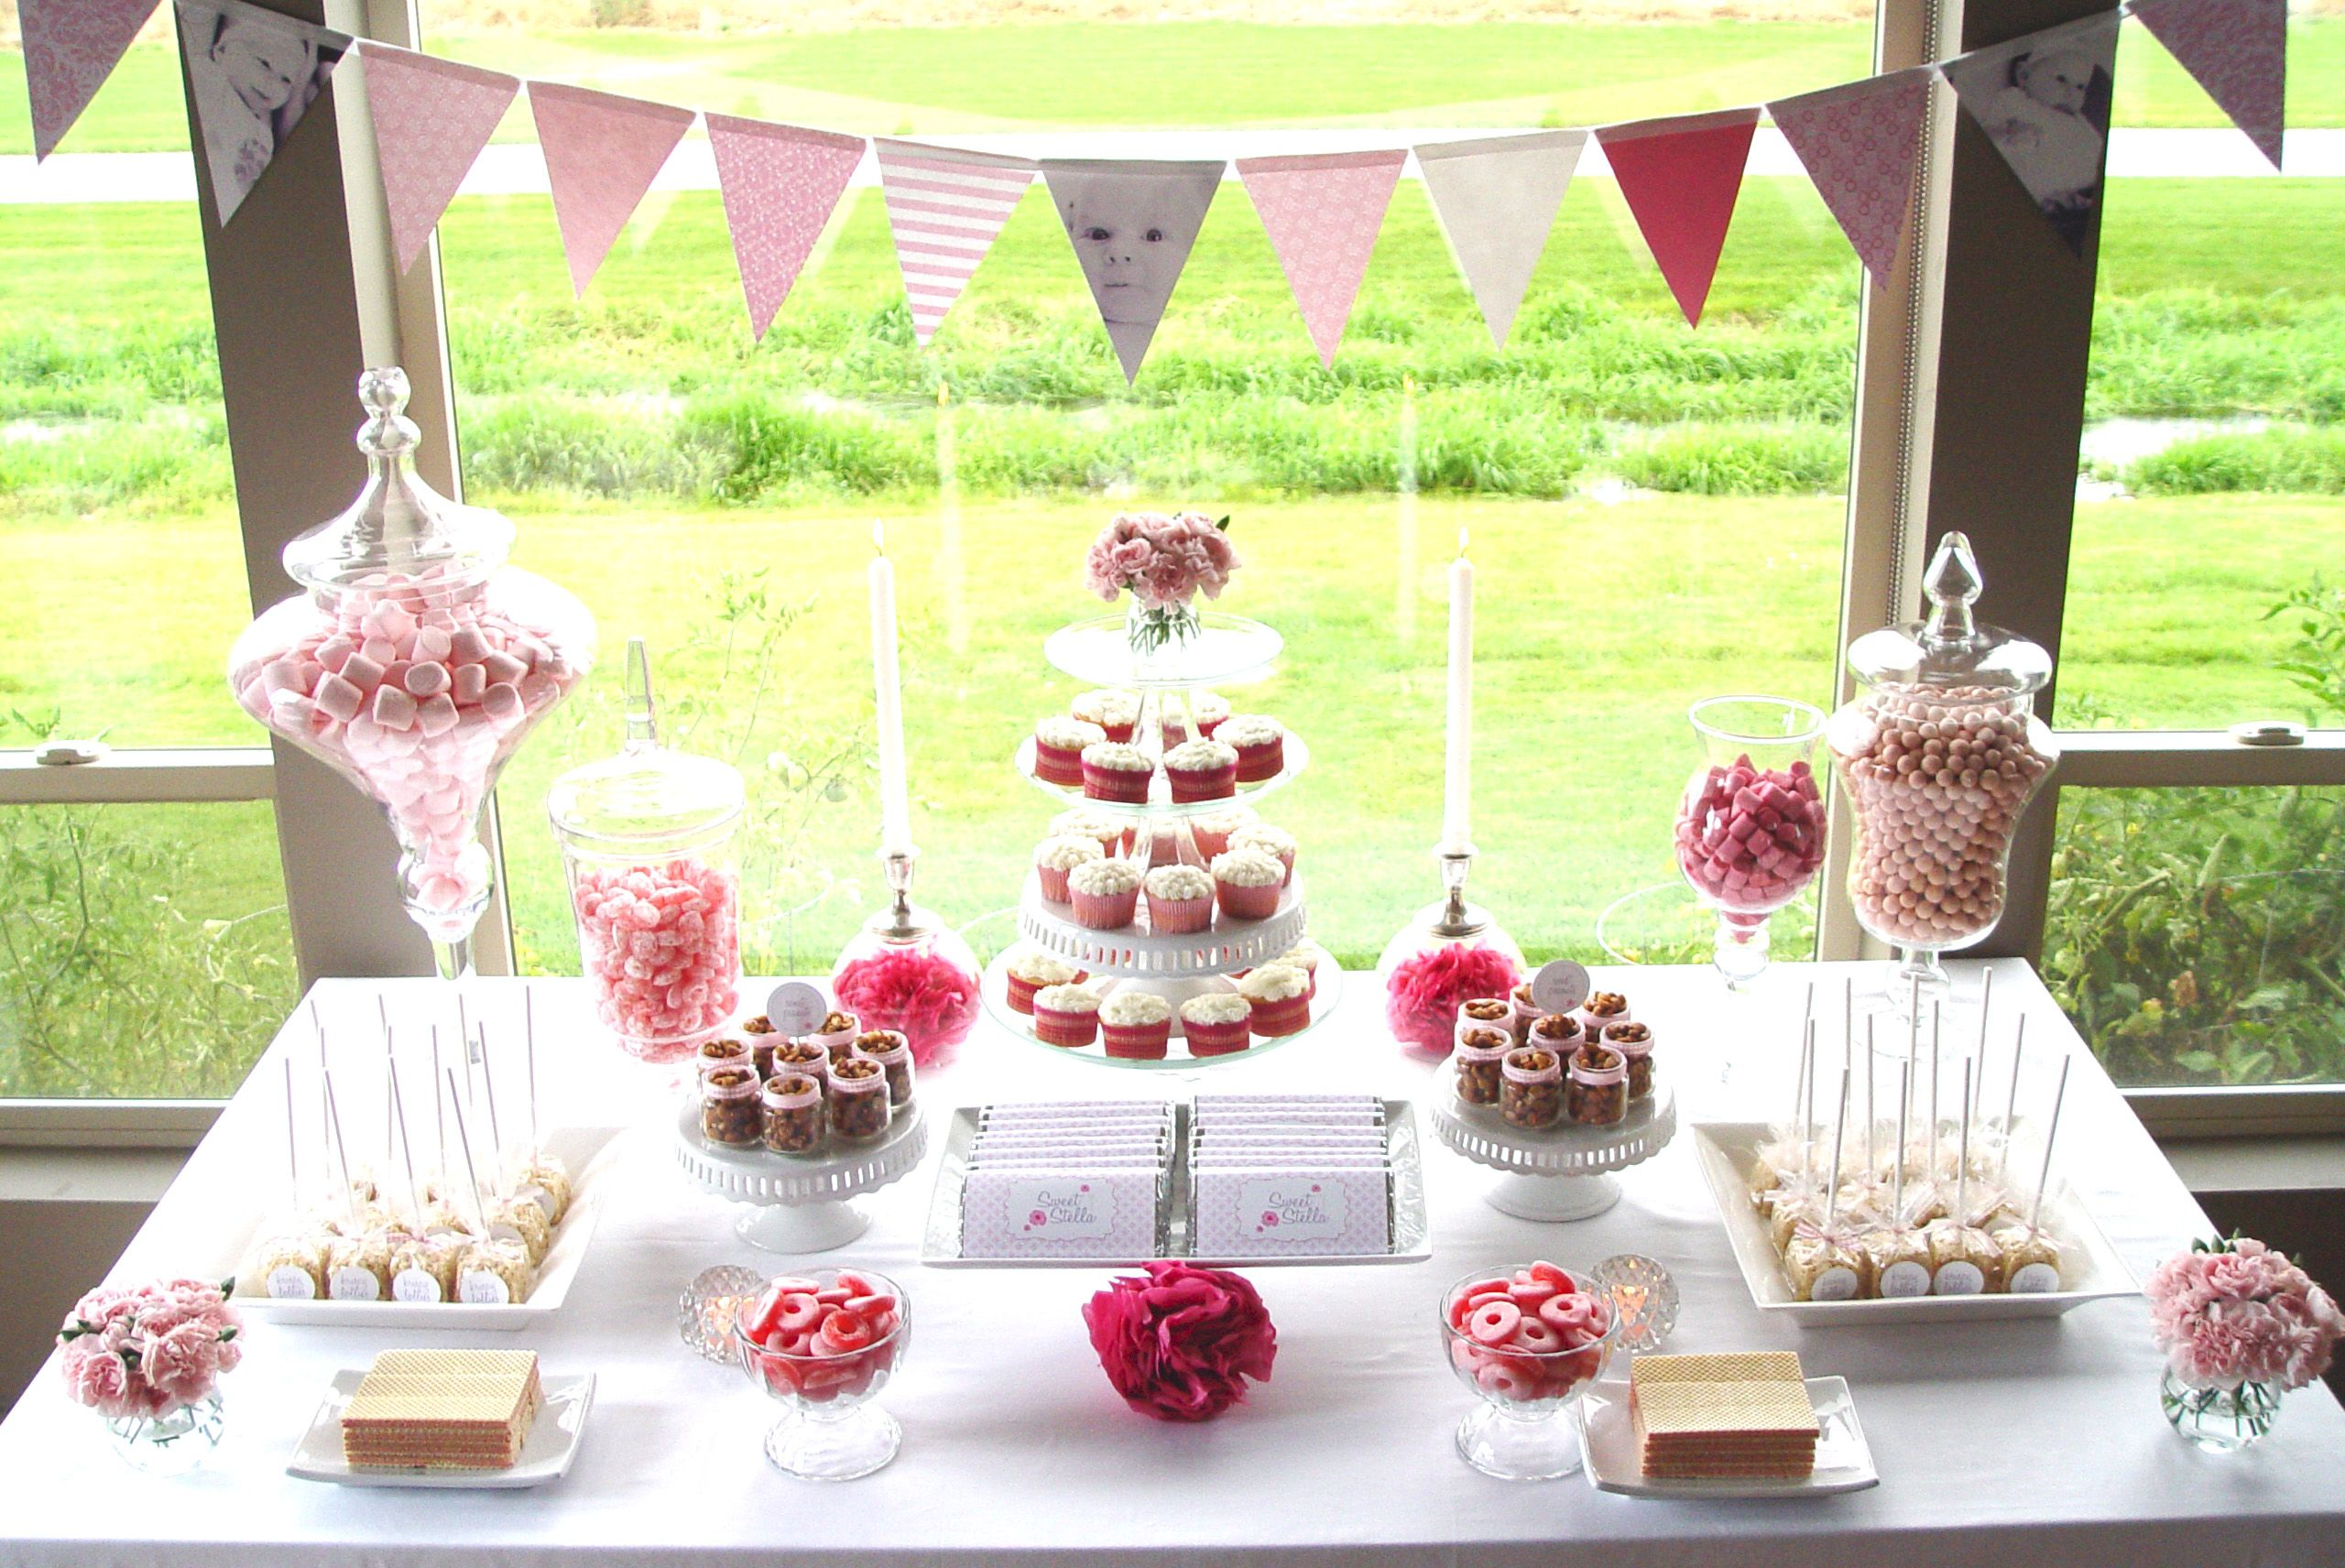 Healthy Valentine's Day Treats - Project Nursery |Sweet Treats Party Table